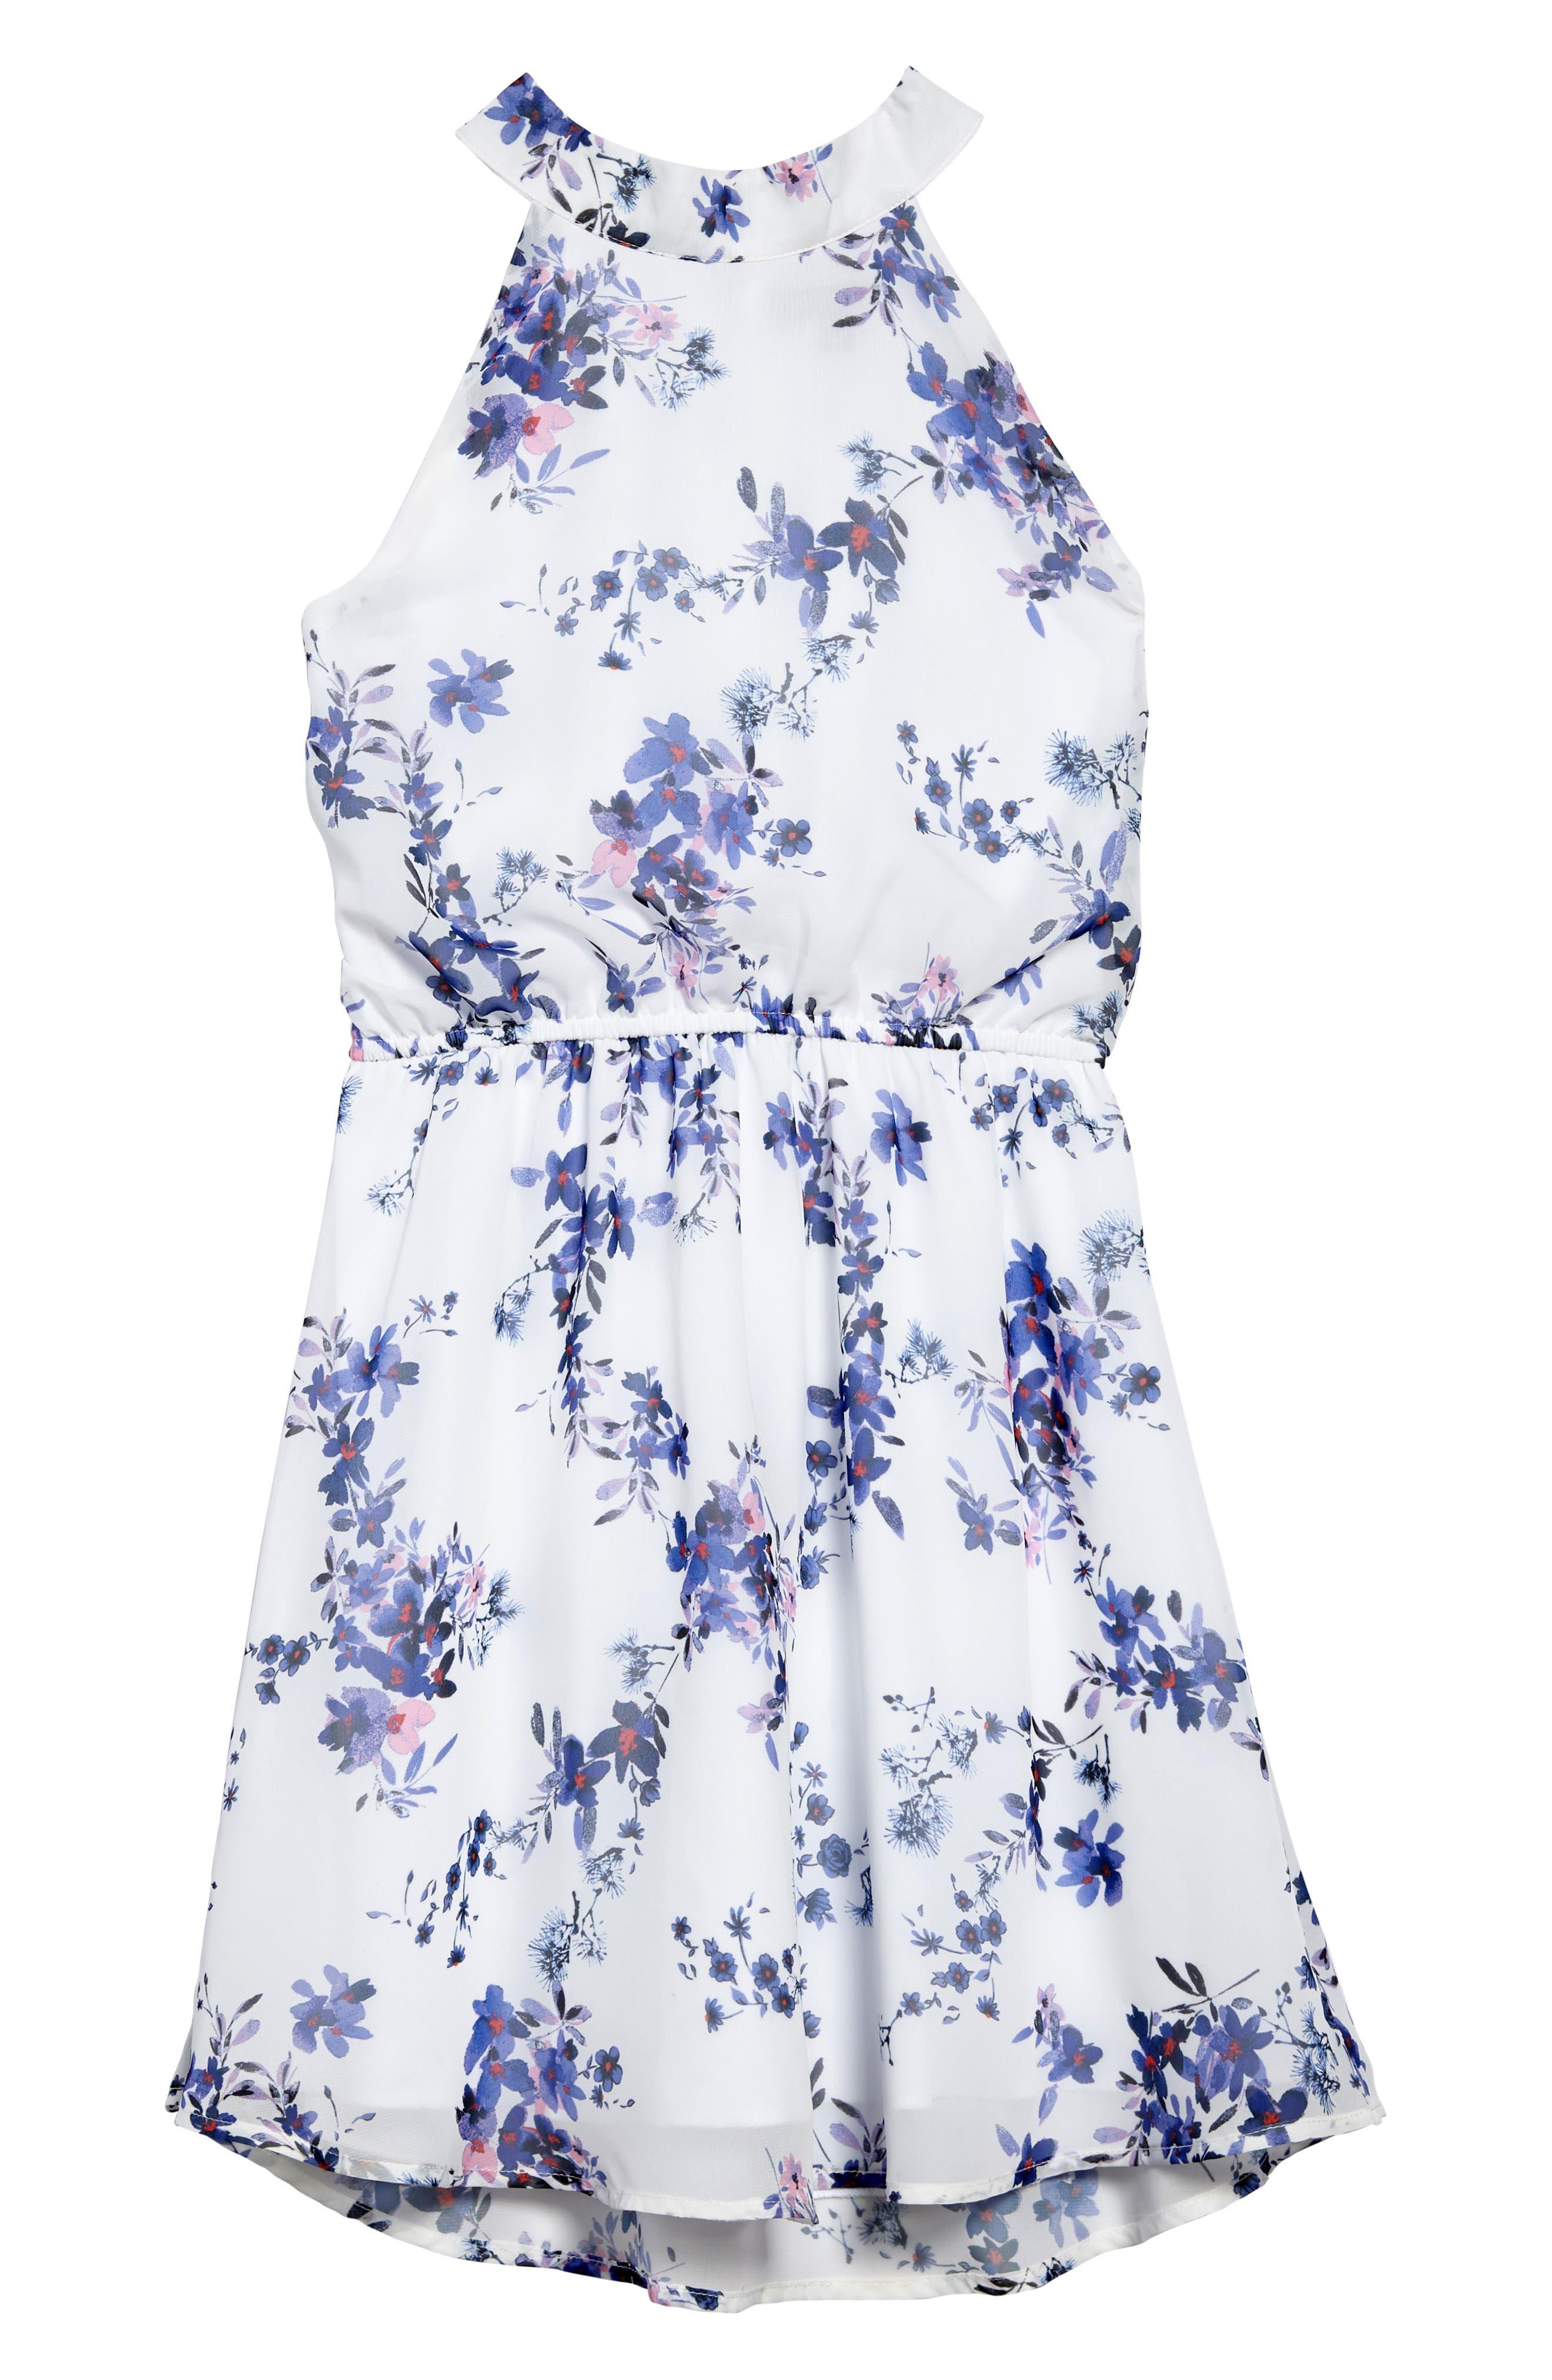 Main Image - Ava & Yelly Floral Mock Neck Dress (Big Girls)